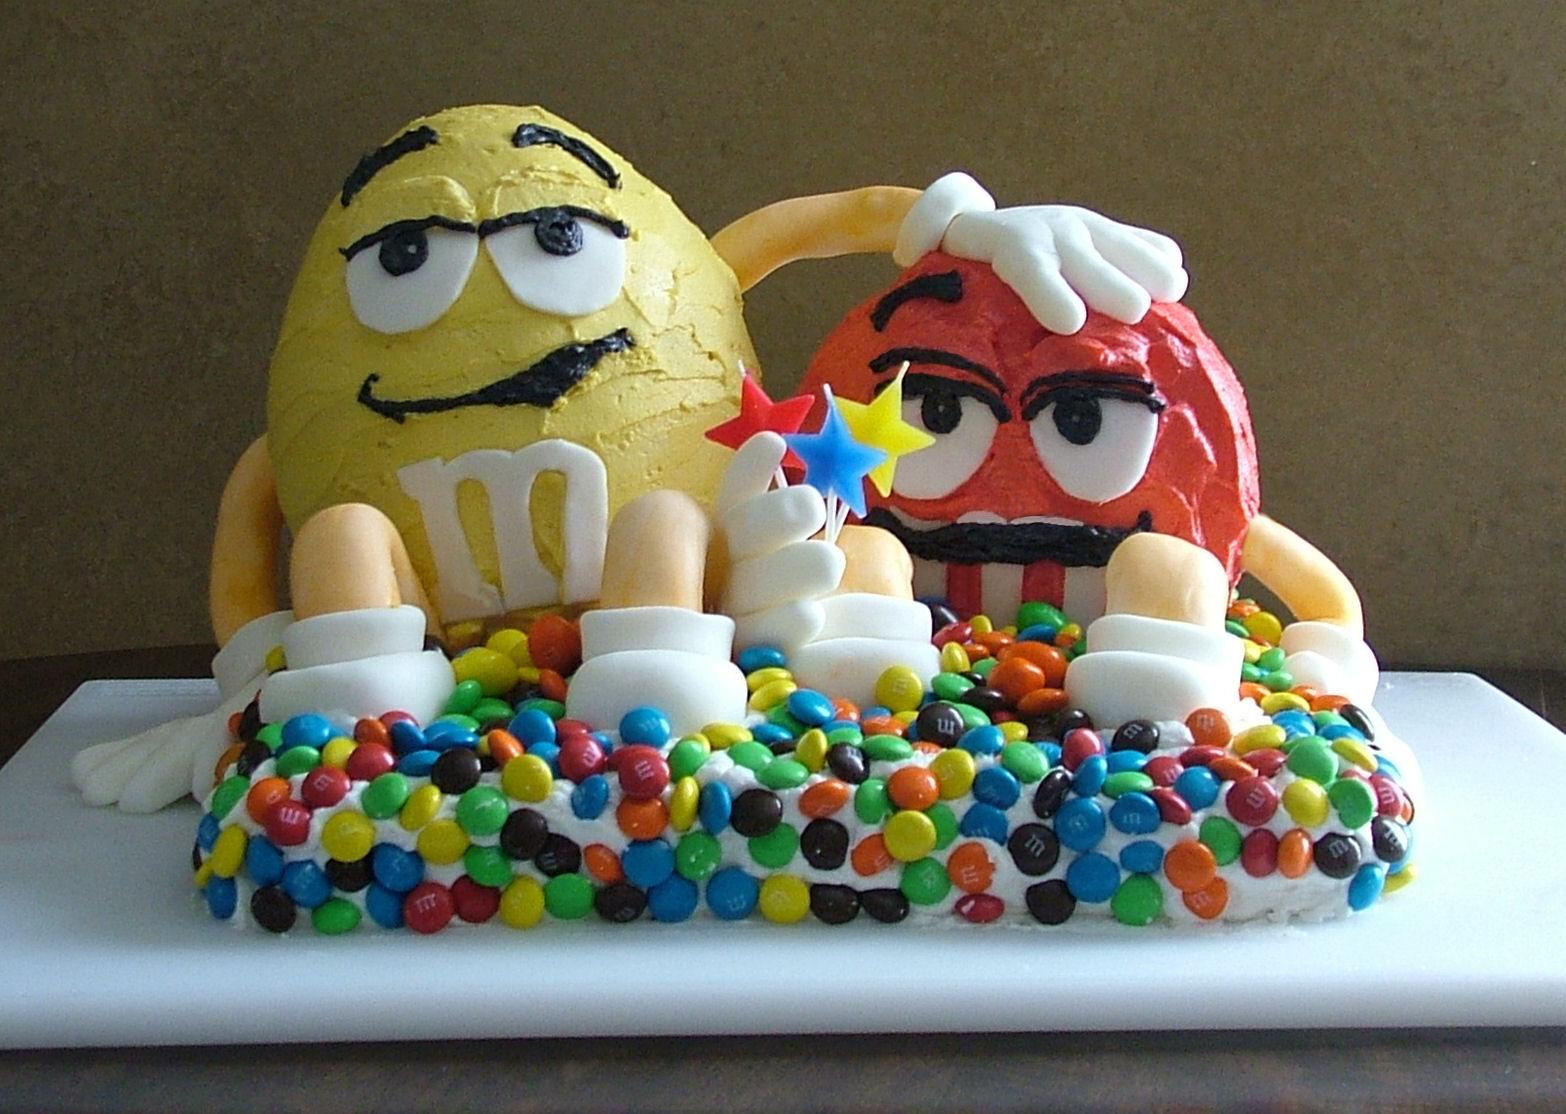 Cake guru essential ingredients m ms for M m cake decoration ideas